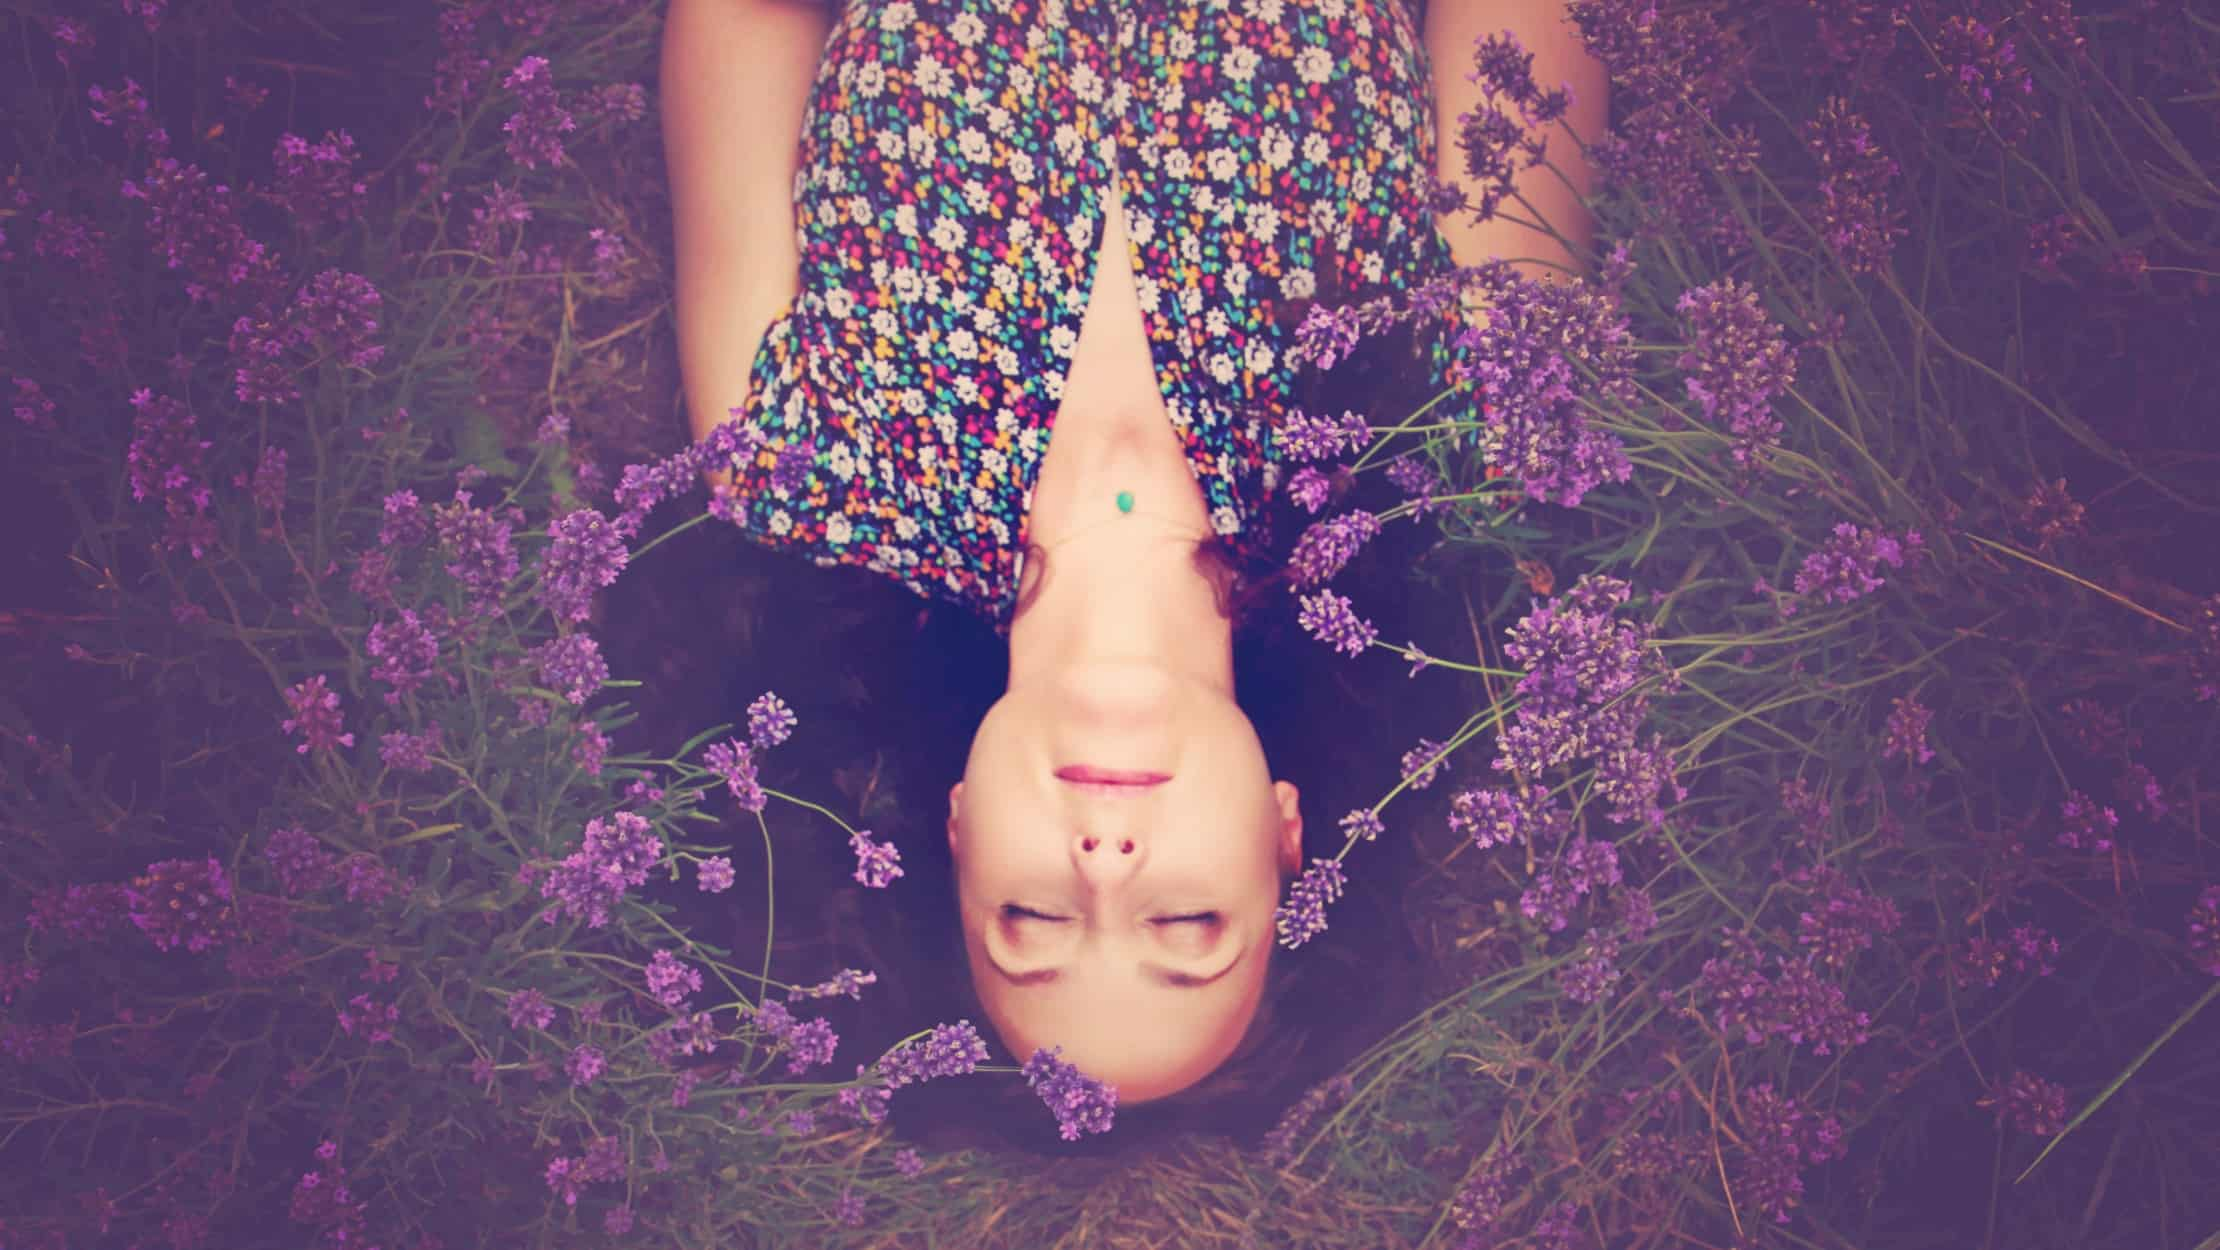 Asleep in a field full of lavender